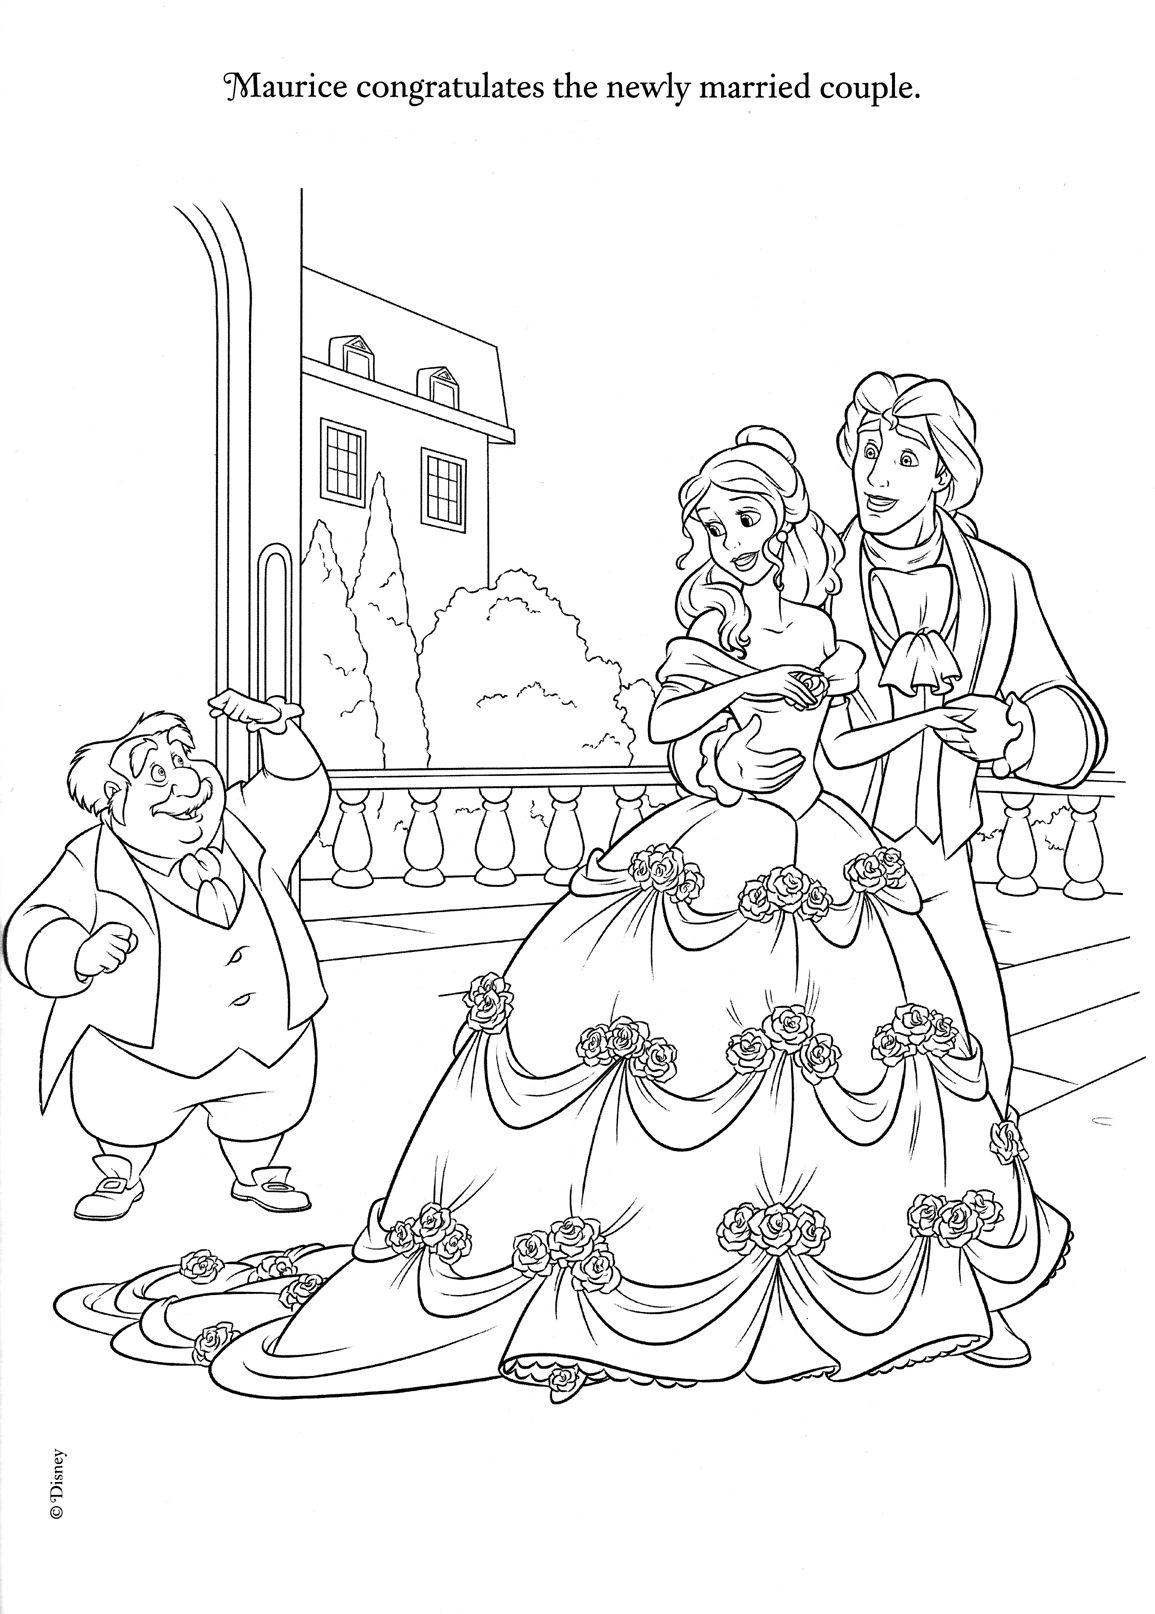 Disney Coloring Pages Disney Coloring Pages Disney Princess Coloring Pages Cartoon Coloring Pages